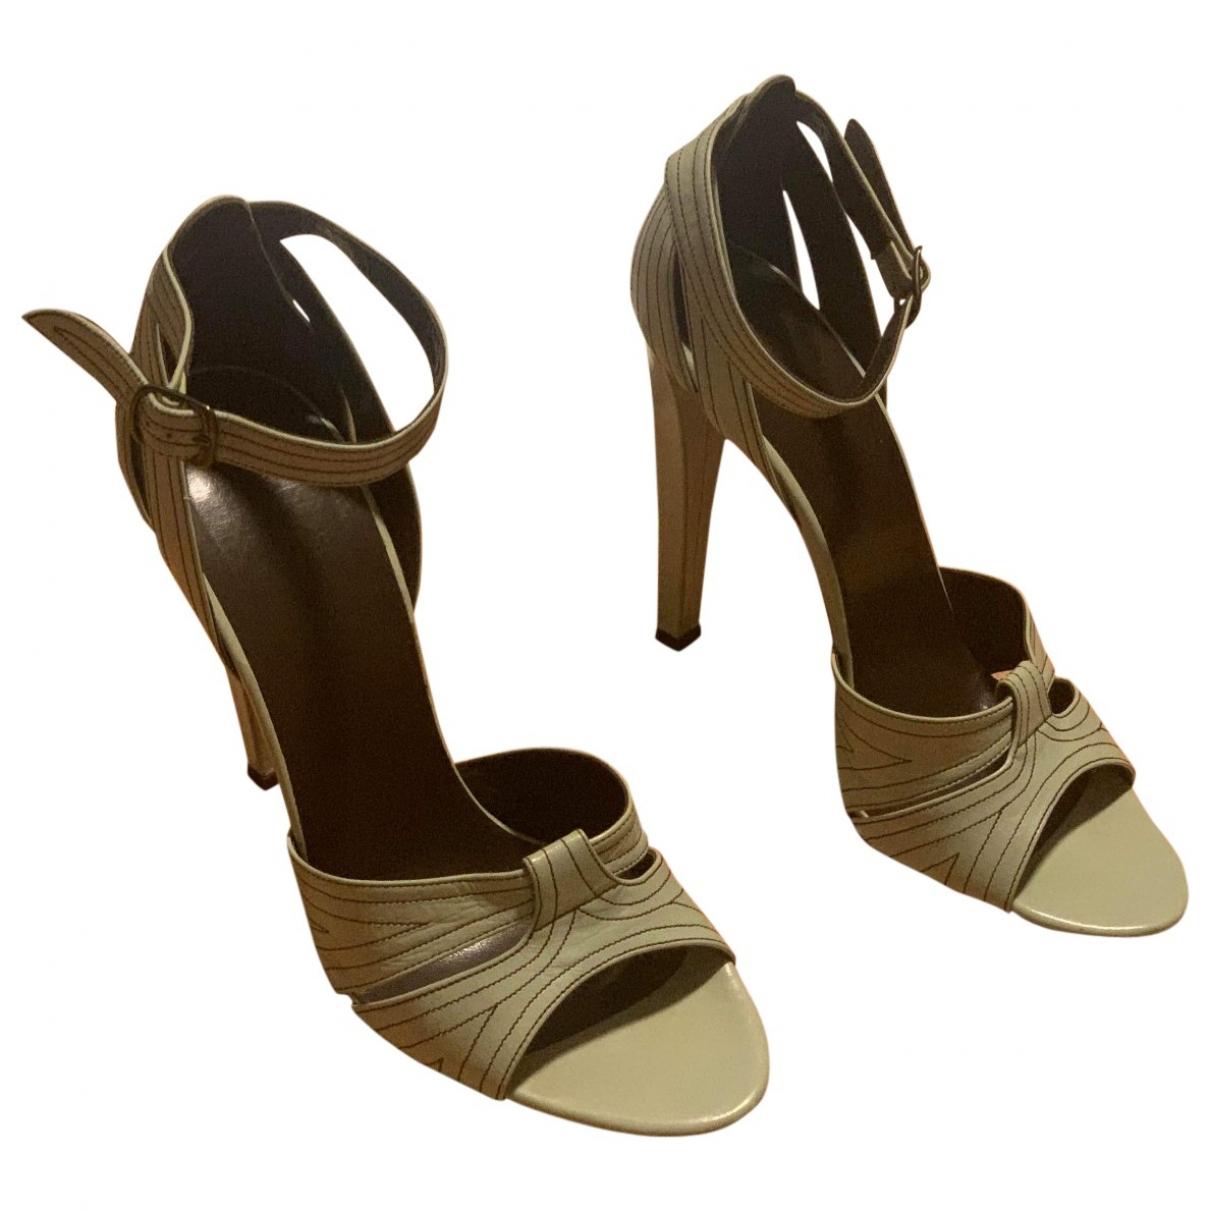 Balenciaga \N Green Leather Sandals for Women 40.5 EU